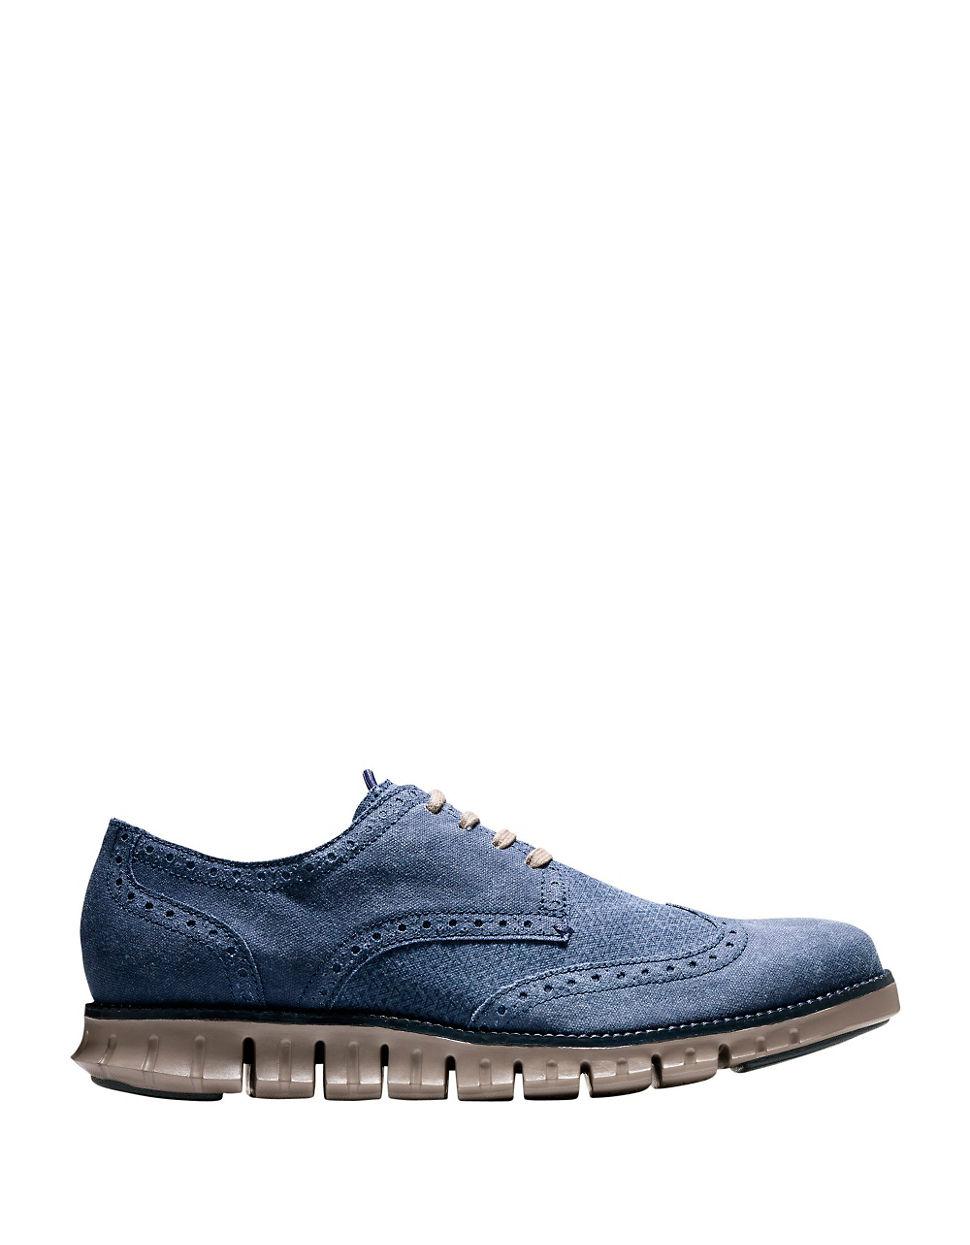 Zegna Sport Shoes Uk